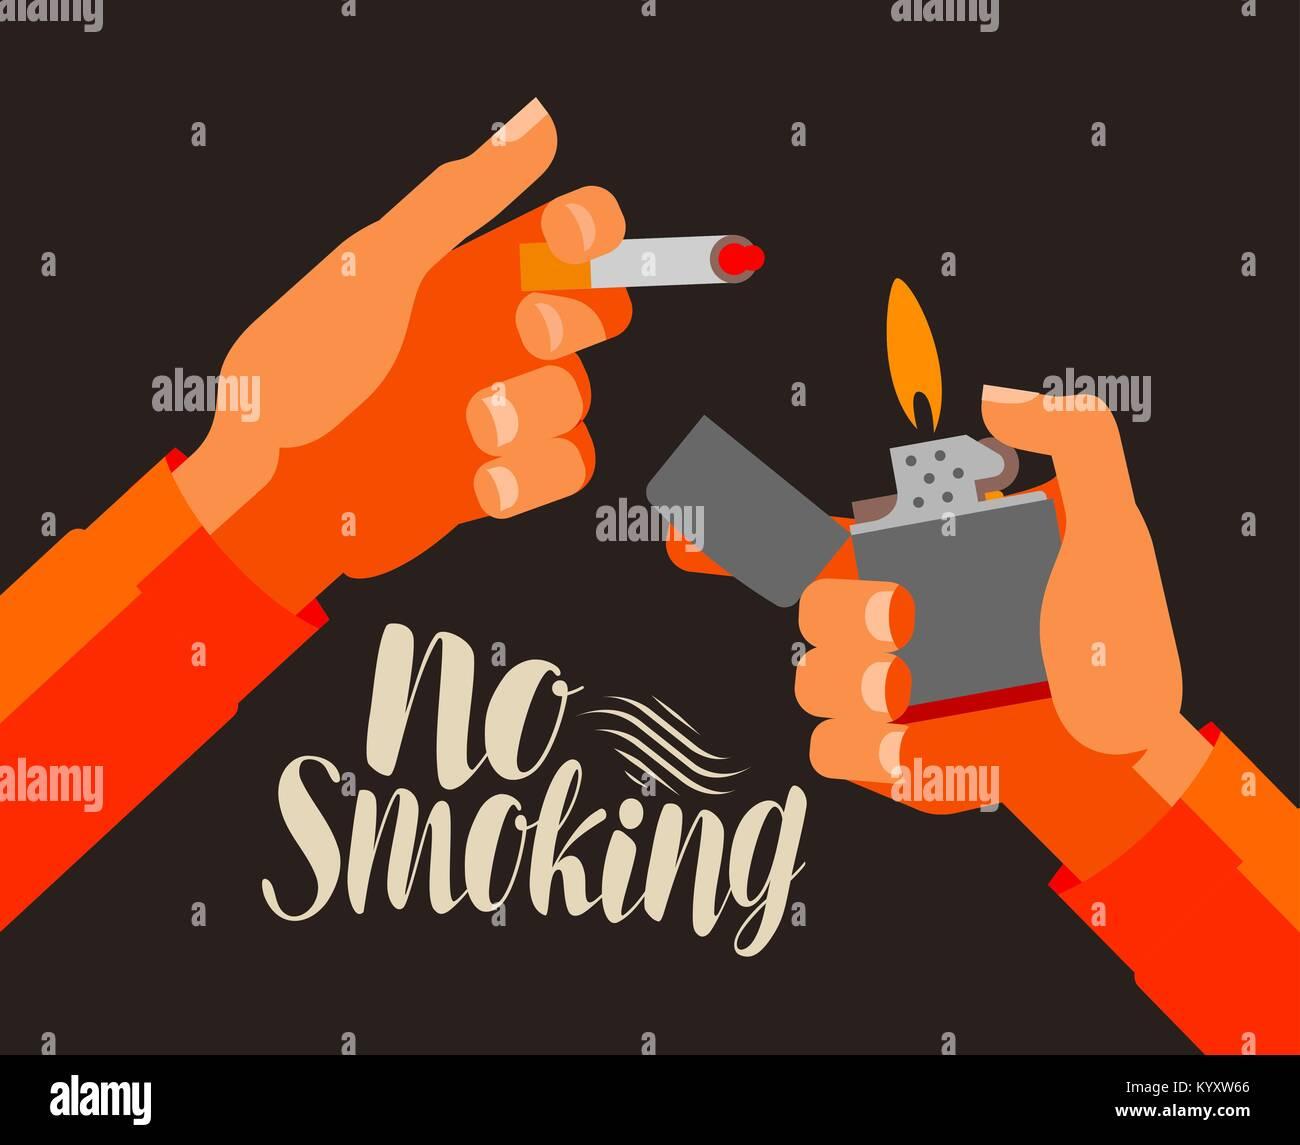 No smoking, banner. Nicotine, cigarette, tobacco concept. Cartoon vector illustration - Stock Image